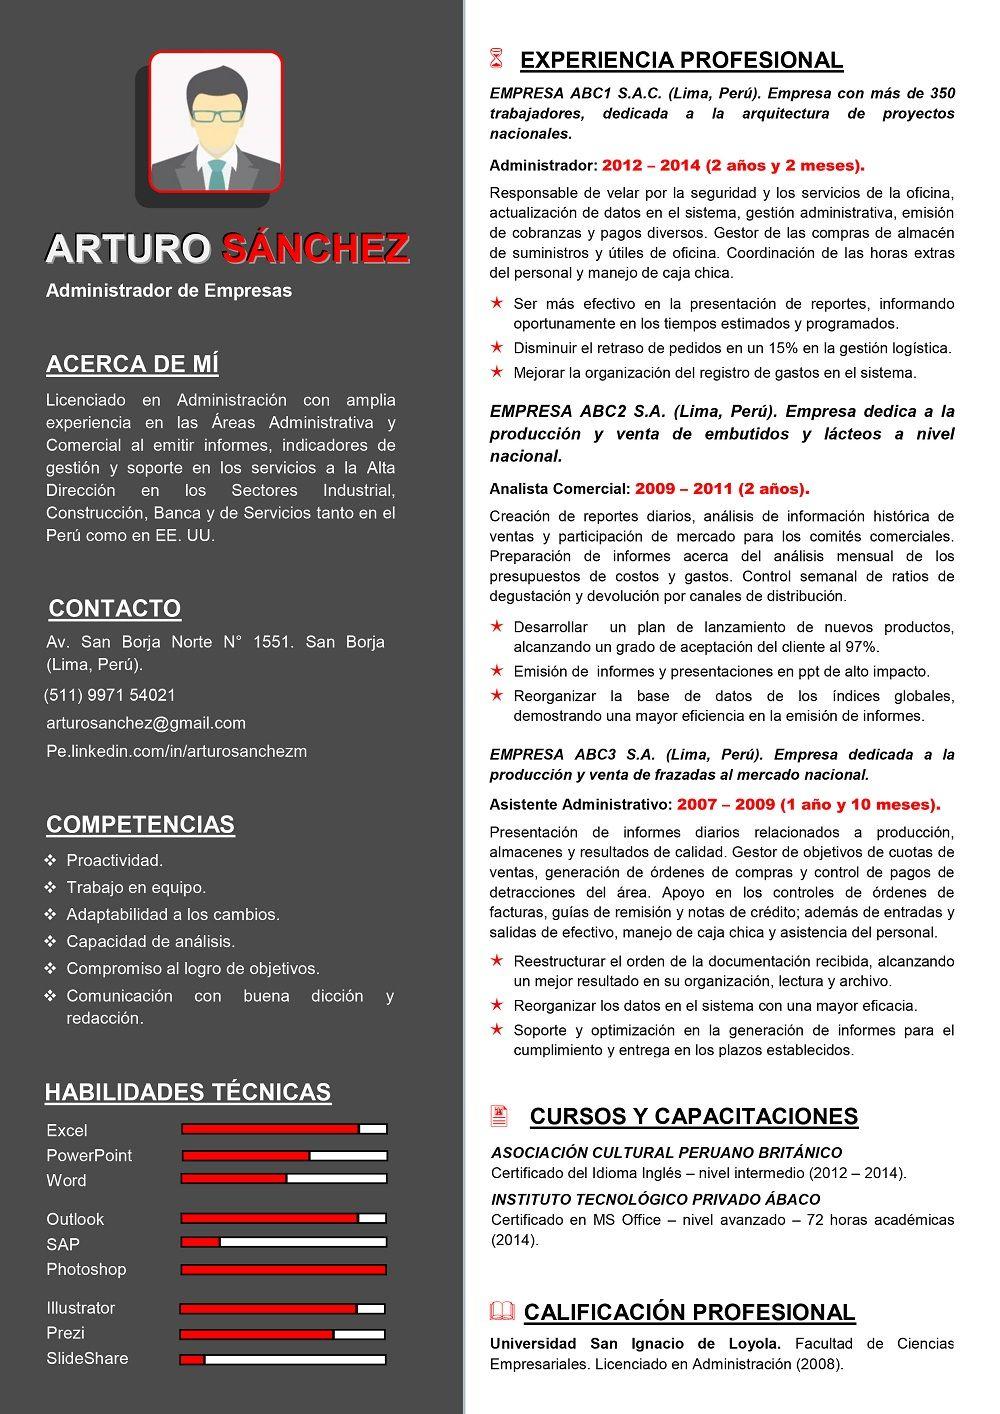 Modelo De Cv 3 Jpg 1000 1414 Curriculum Vitae Resume Curriculum Vitae Curriculum